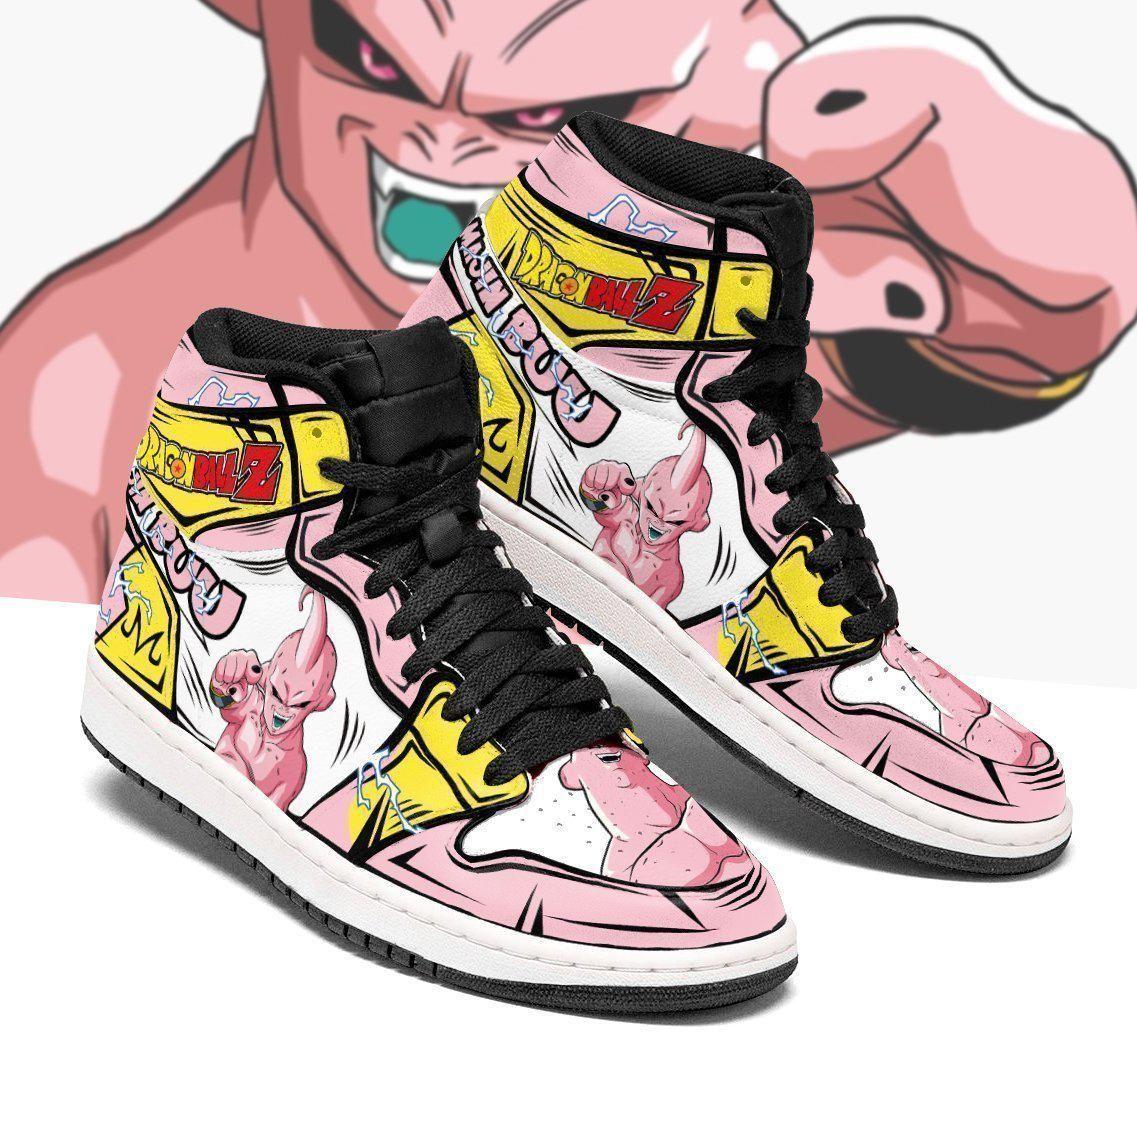 Skinny Majin Buu Sneakers Custom Anime Dragon Ball Z Shoes GO1210